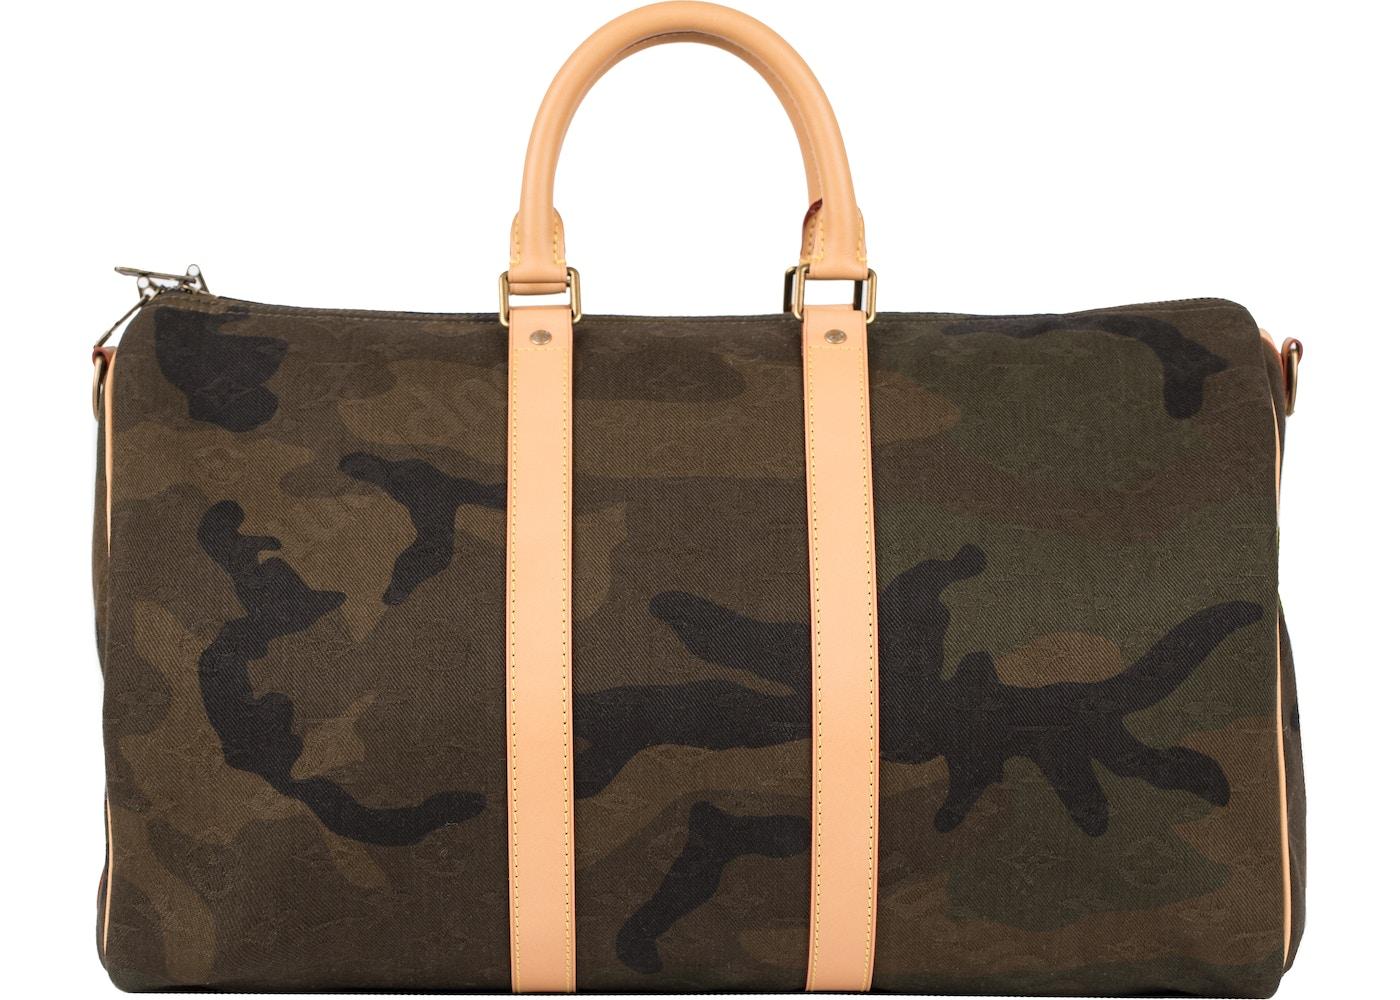 2b6edaa4e42 Louis Vuitton x Supreme Keepall Bandouliere 45 Camo